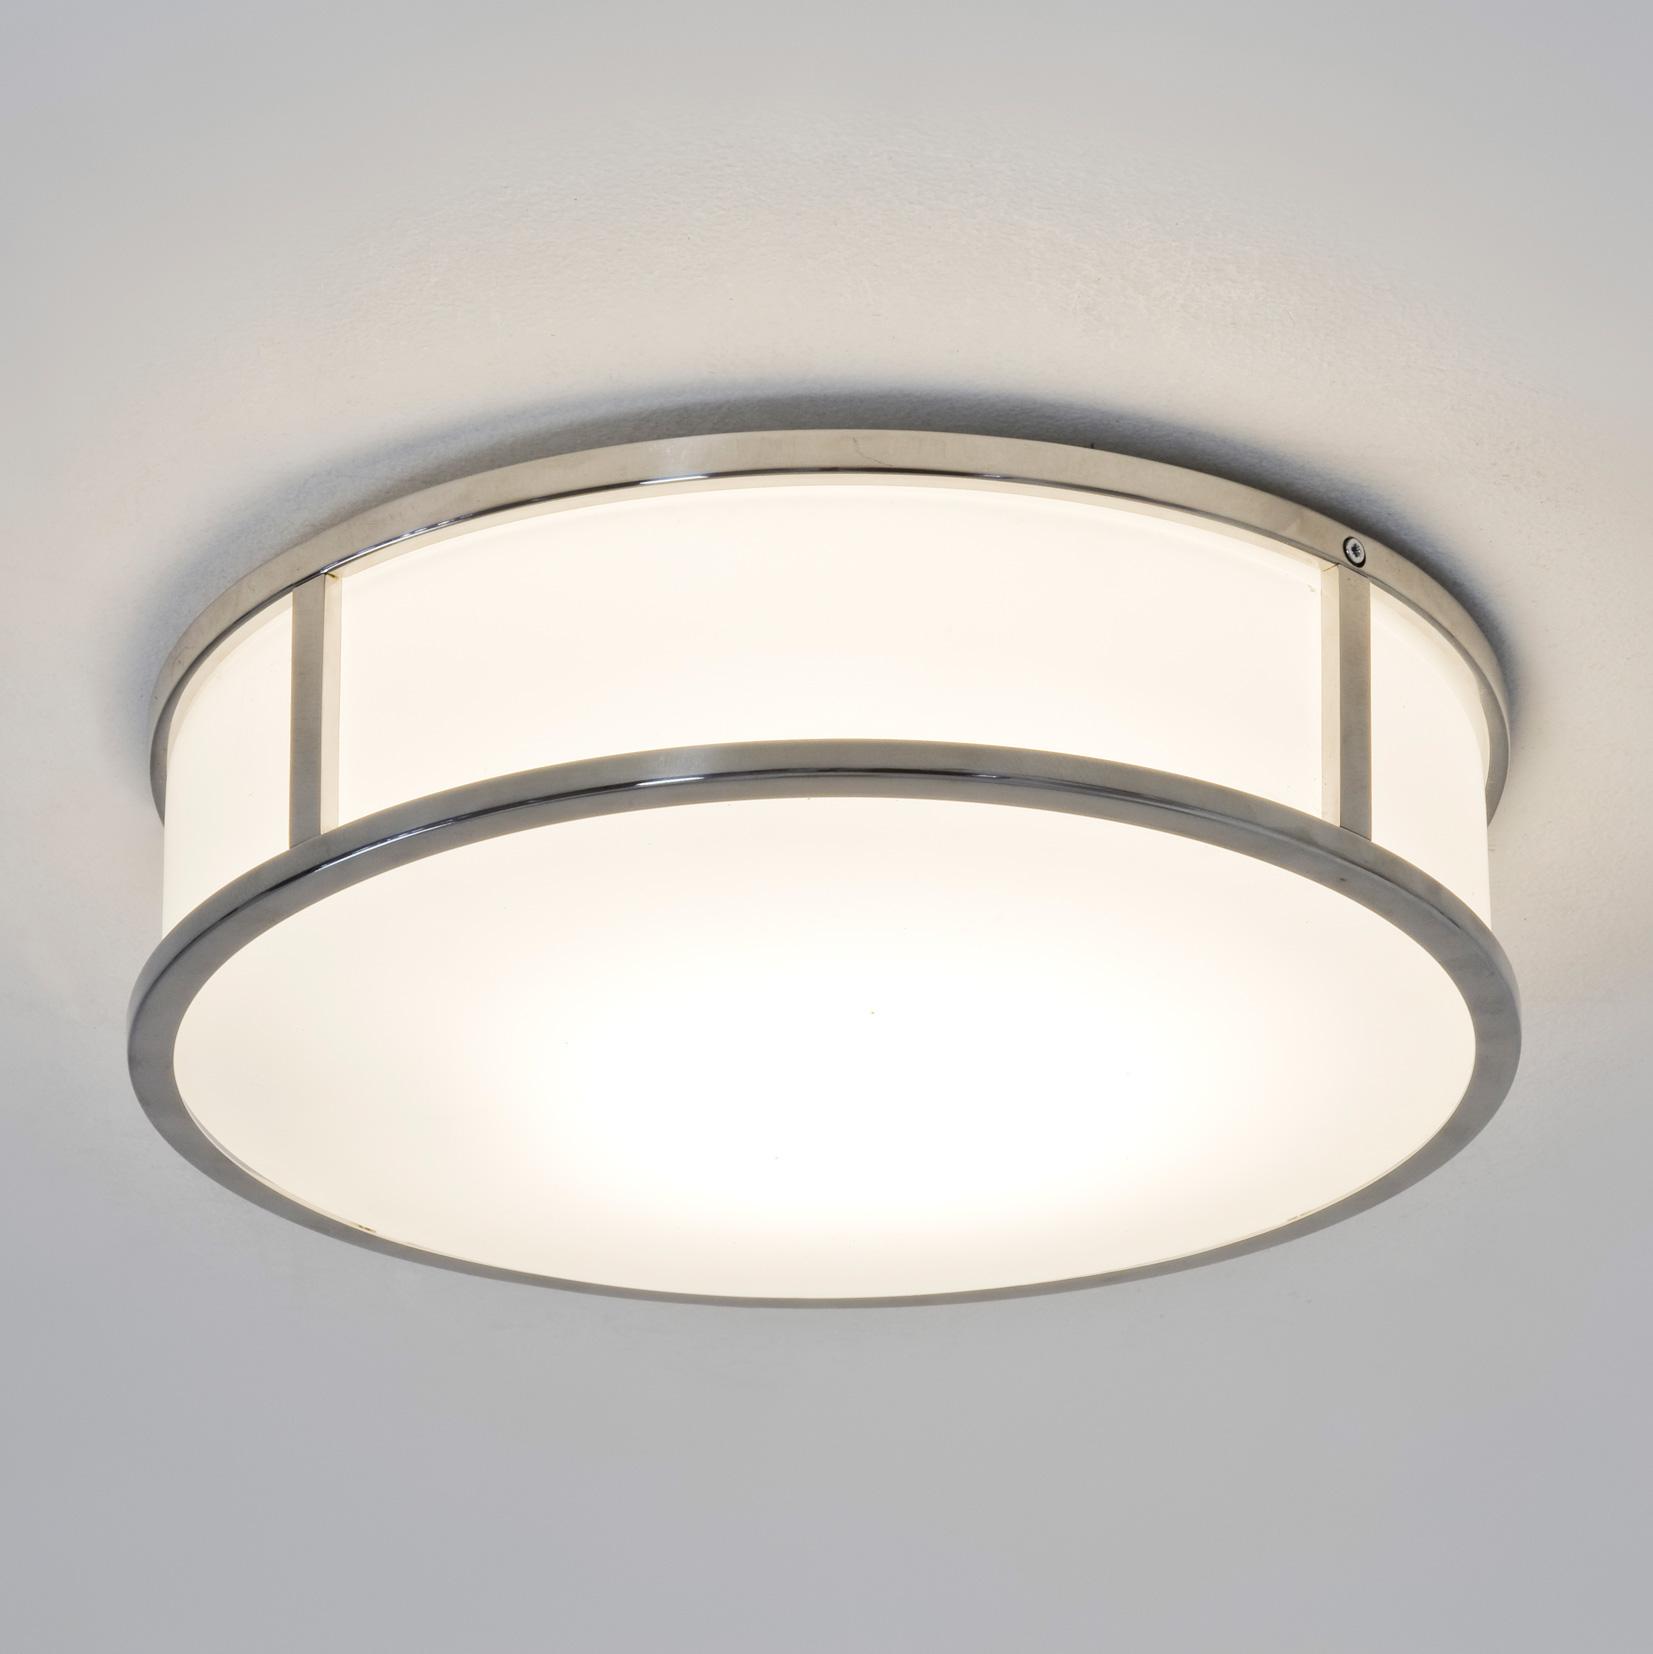 Astro Mashiko round bathroom ceiling light polished chrome ...